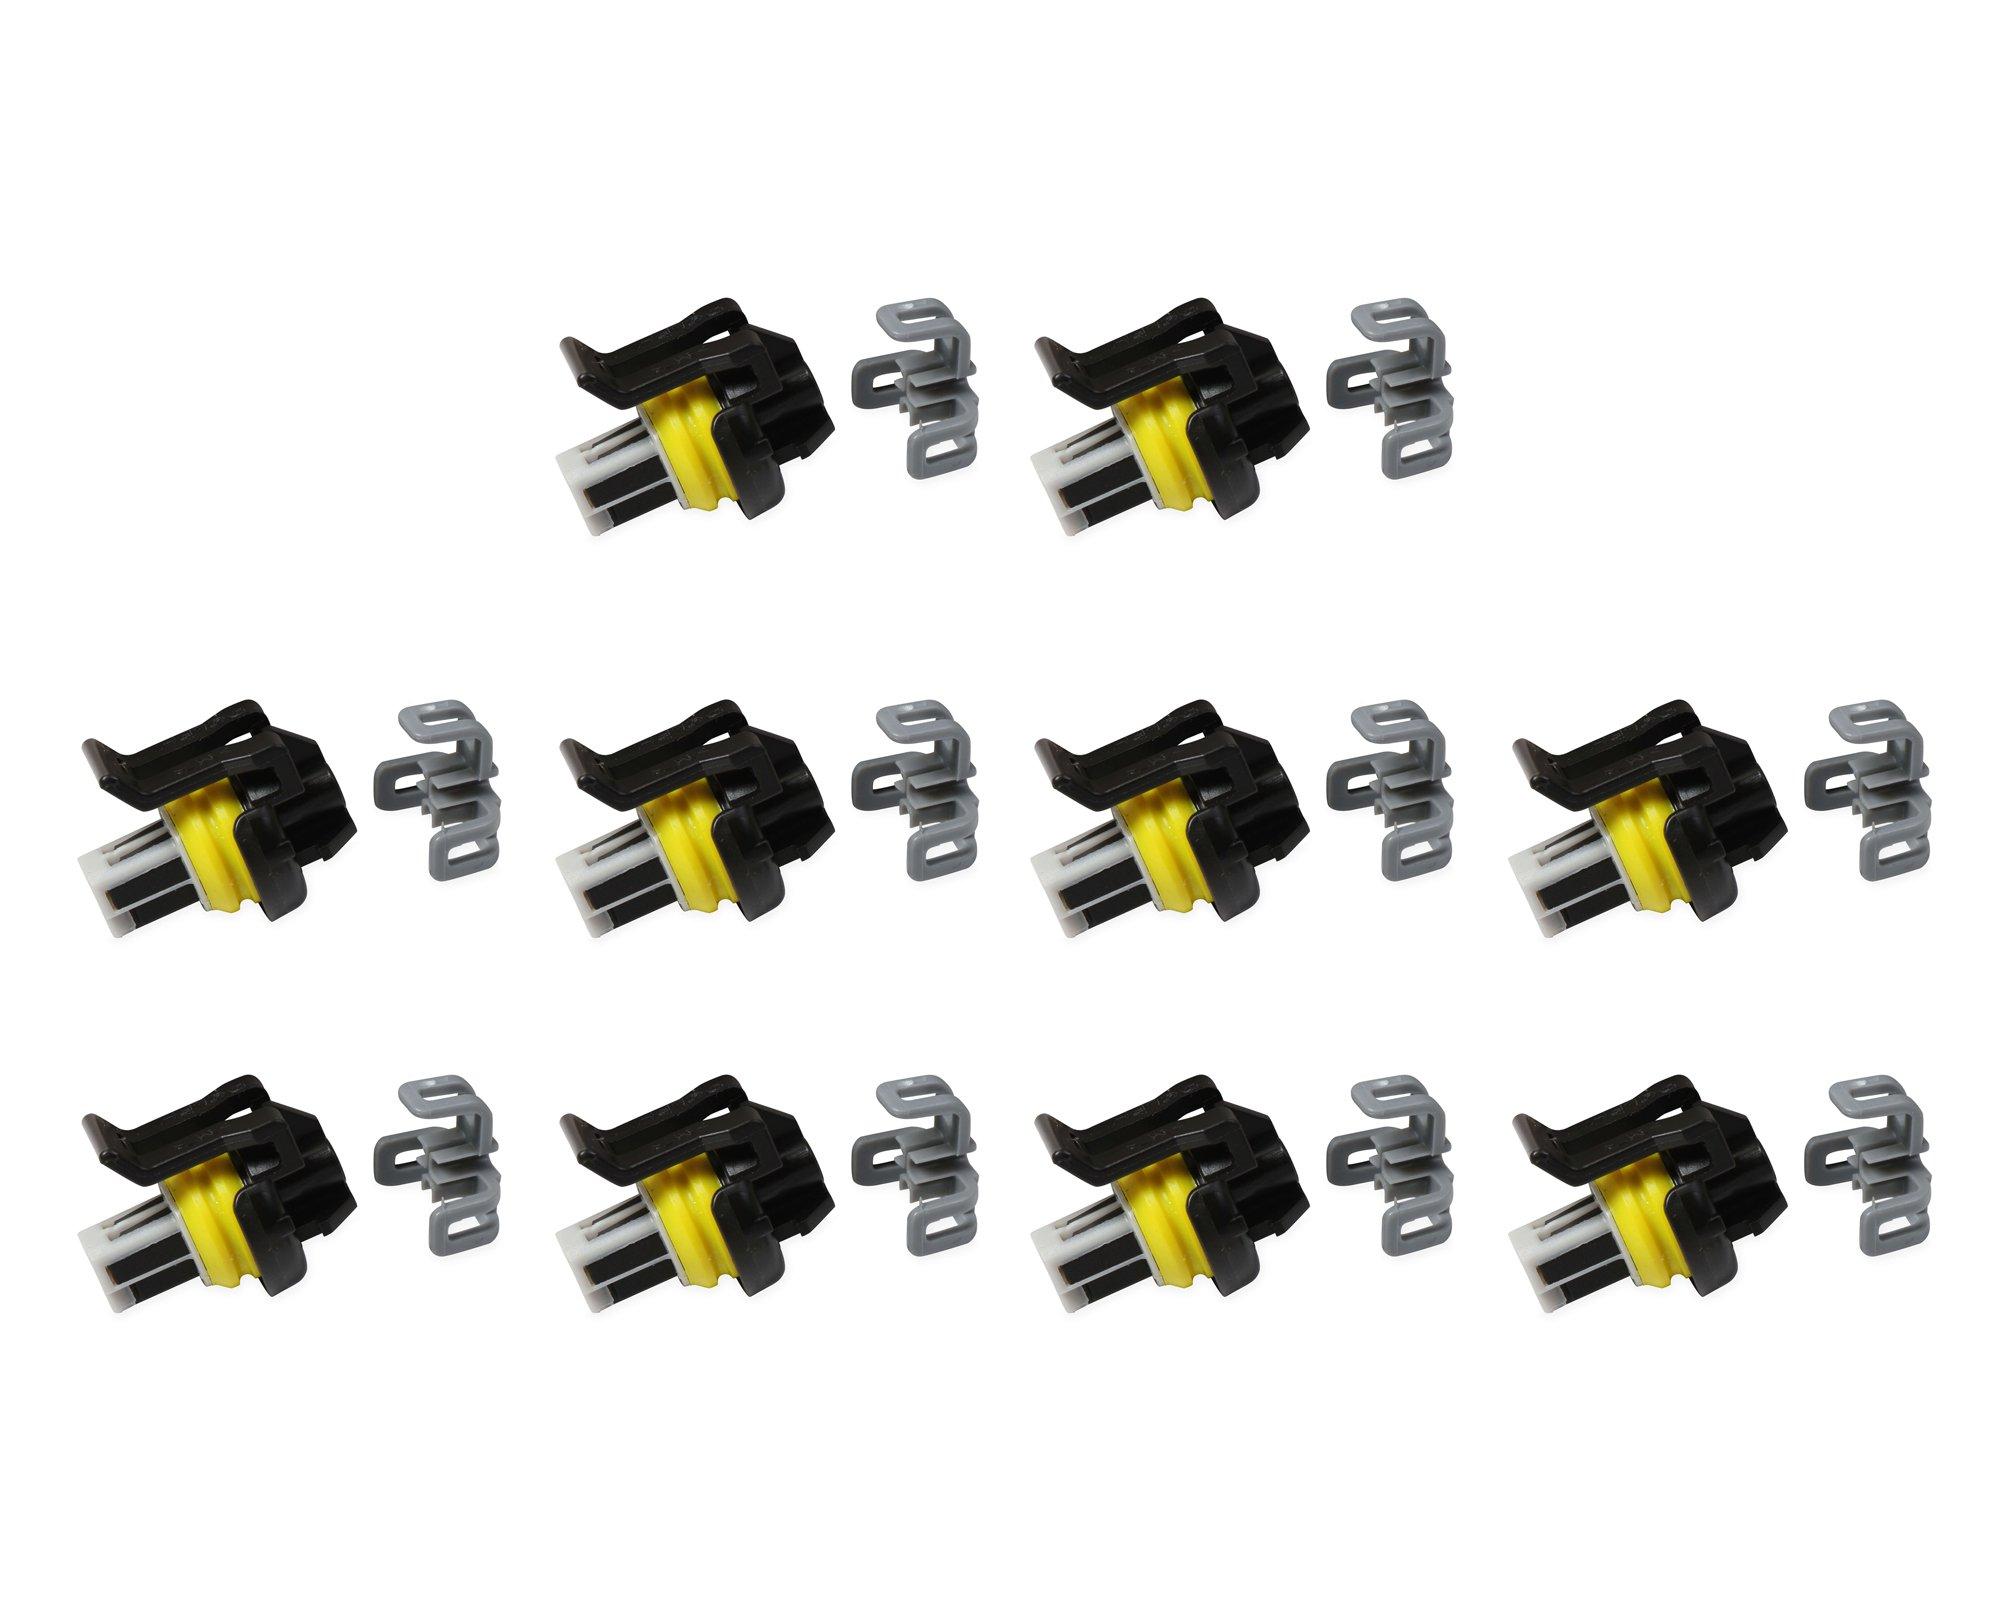 Holley Efi 570 306 Throttle Position Sensor And Pressure